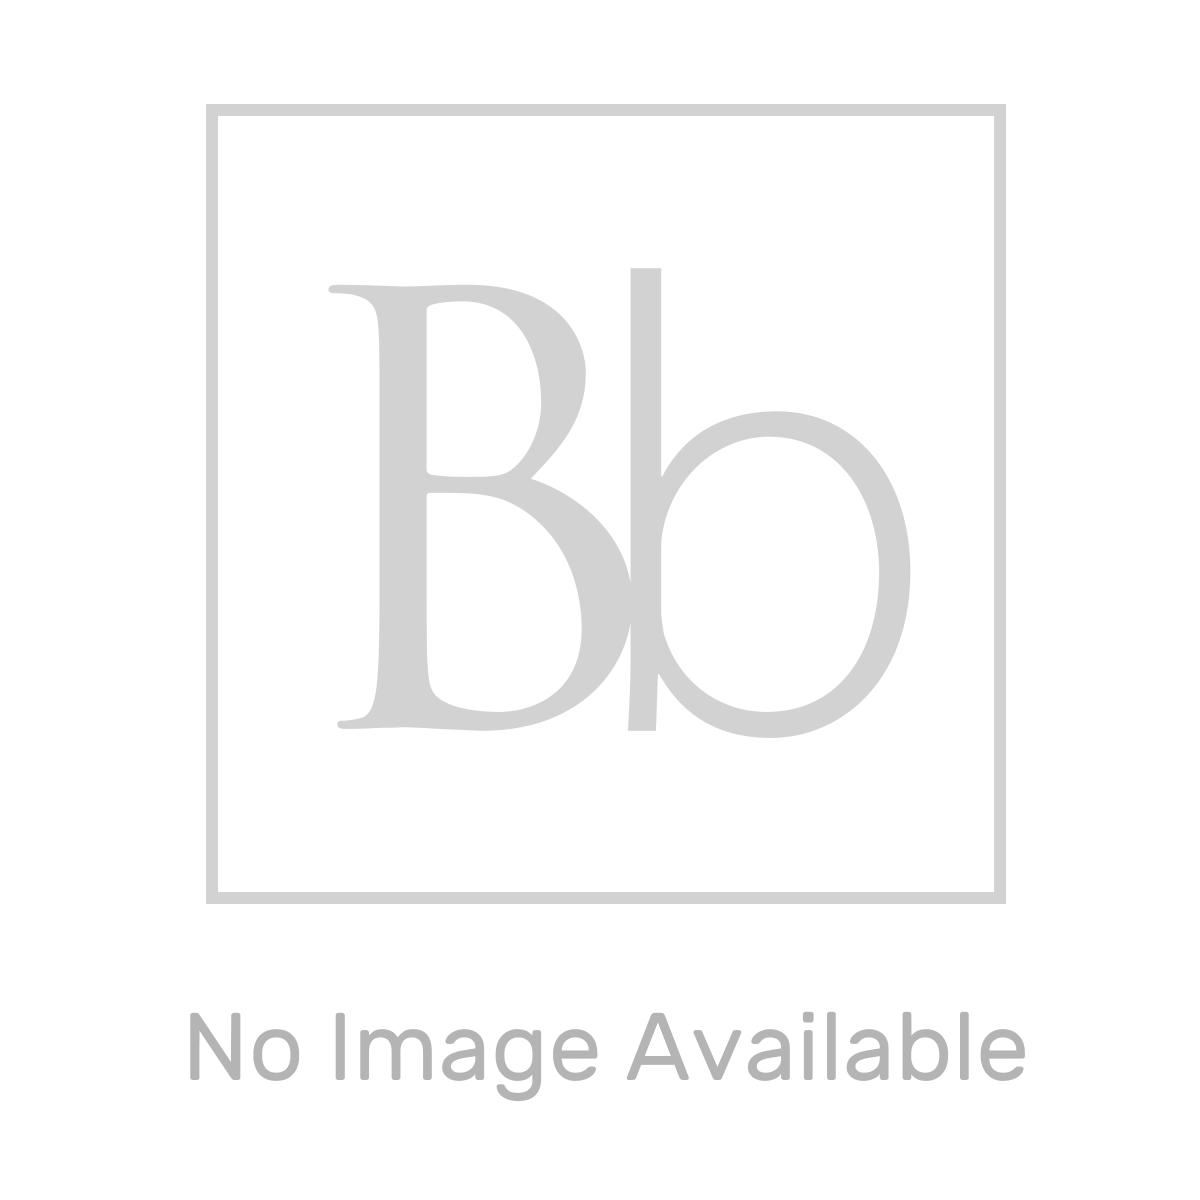 RAK Venice Waterless Urinal Measurements